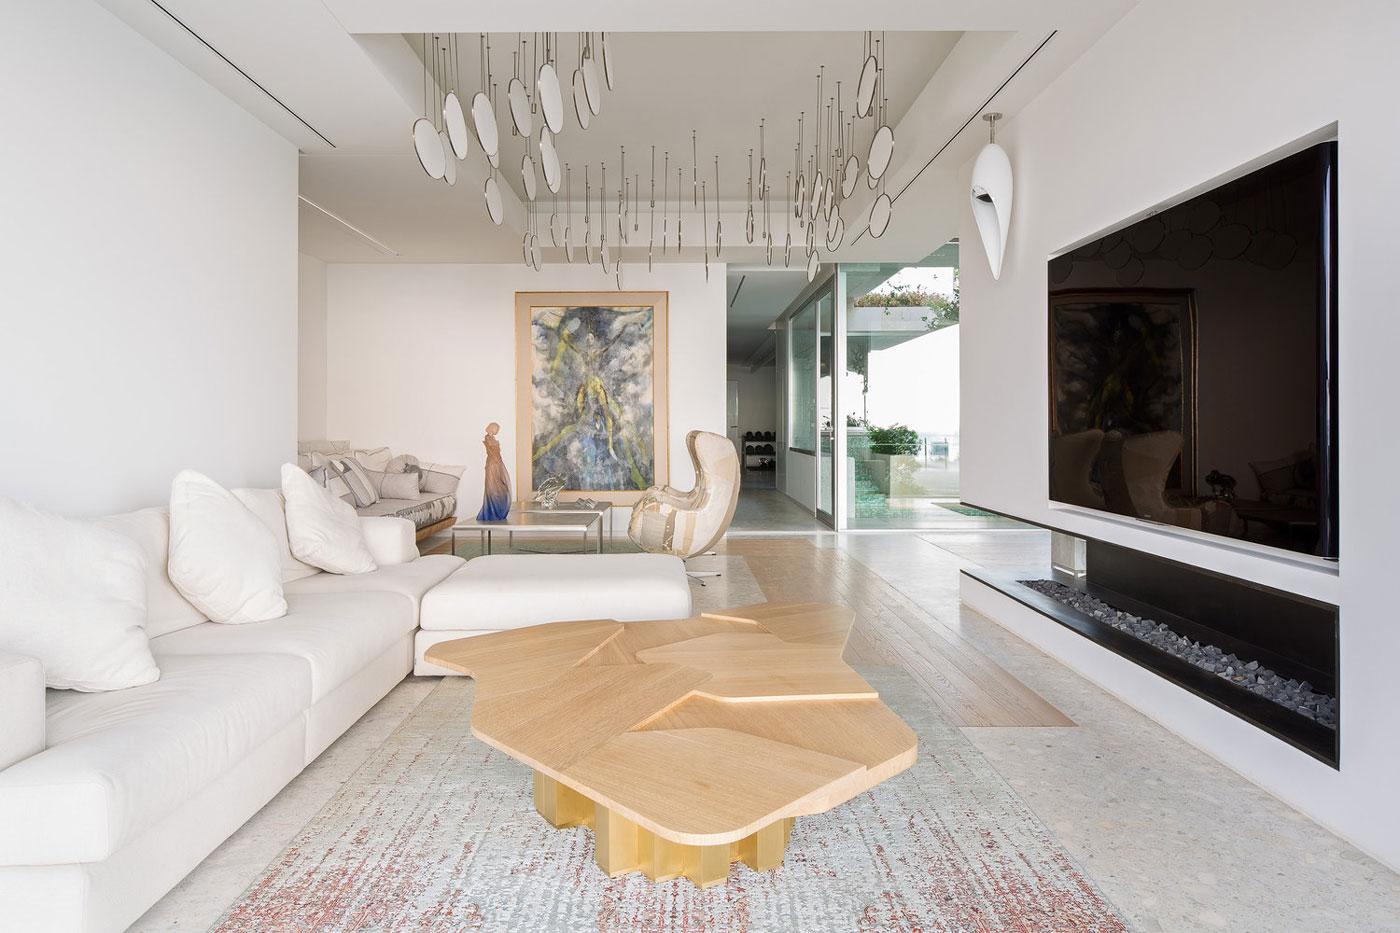 White sofa, coffee table, rug